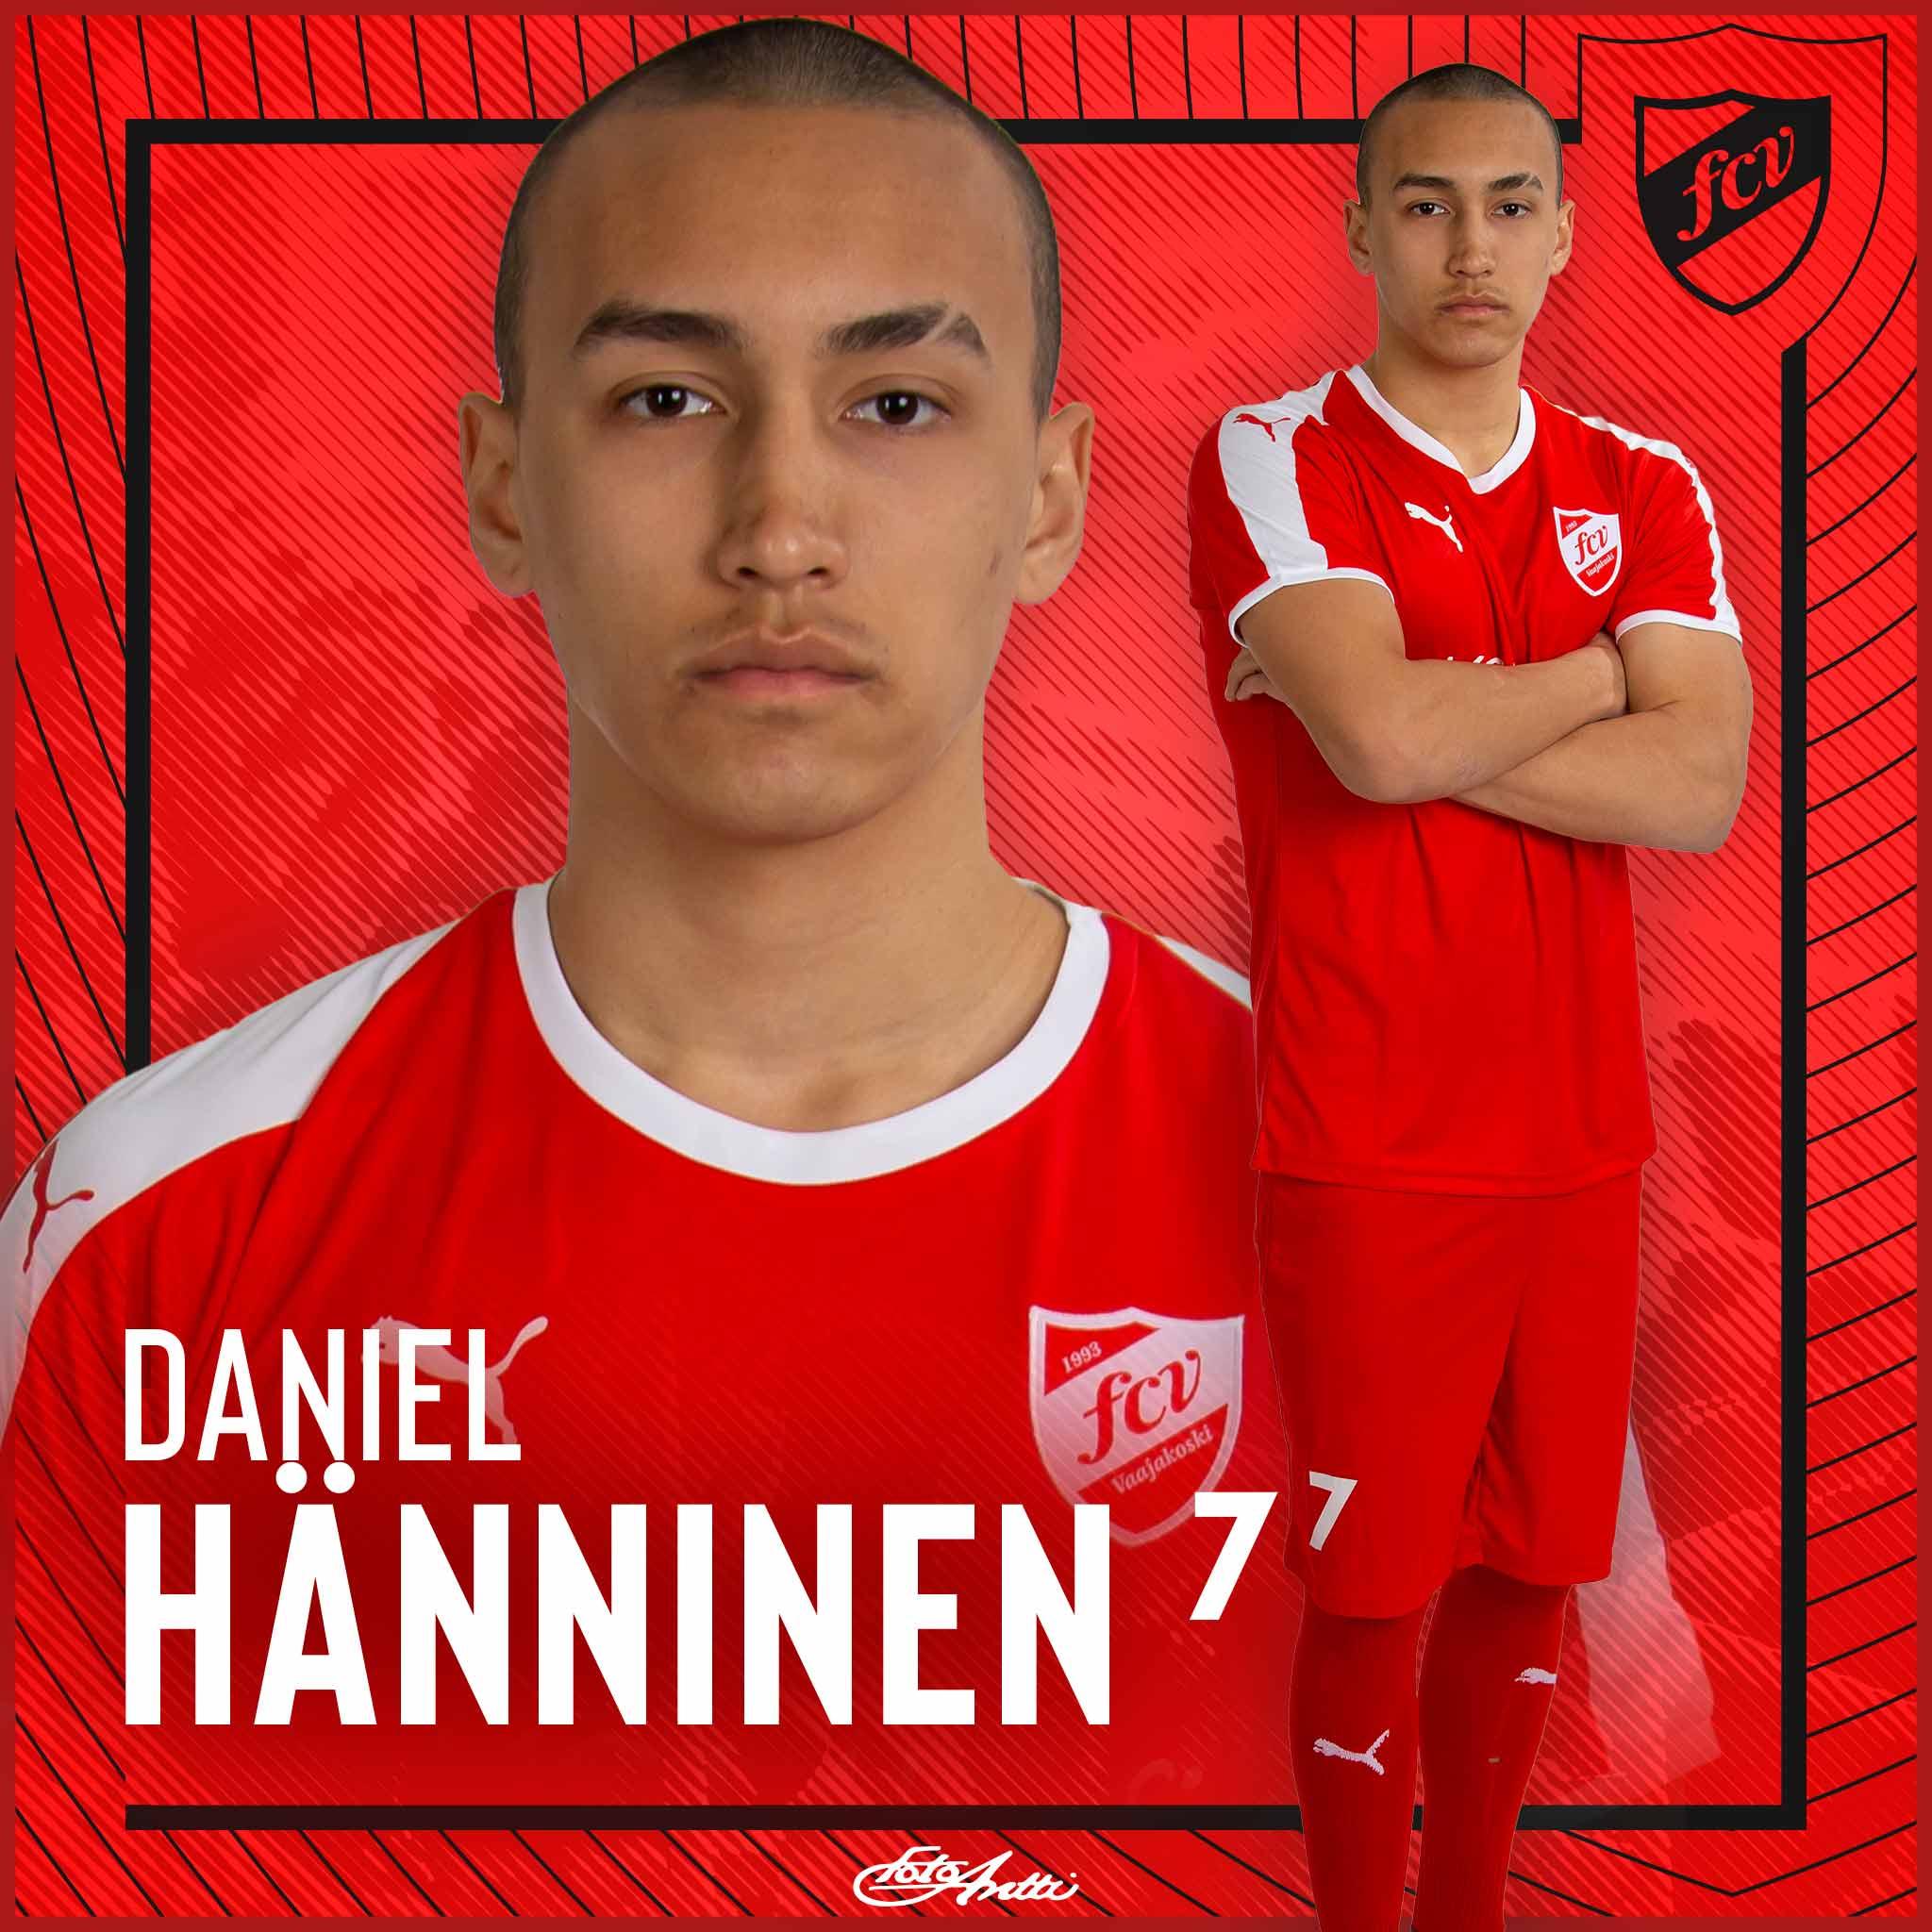 Daniel Hänninen